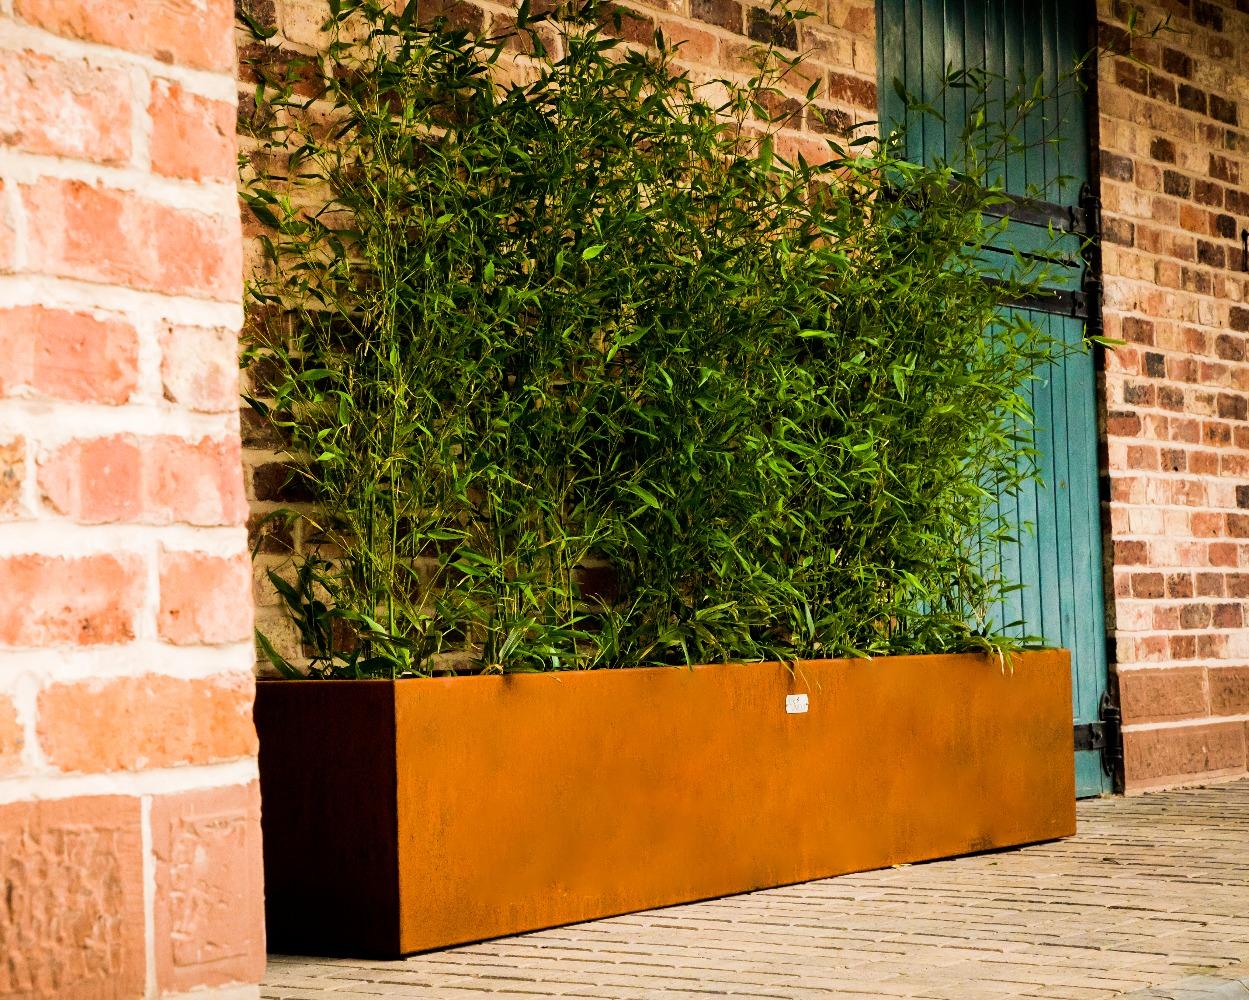 Rustic Corten Steel Extra Large Trough Planter